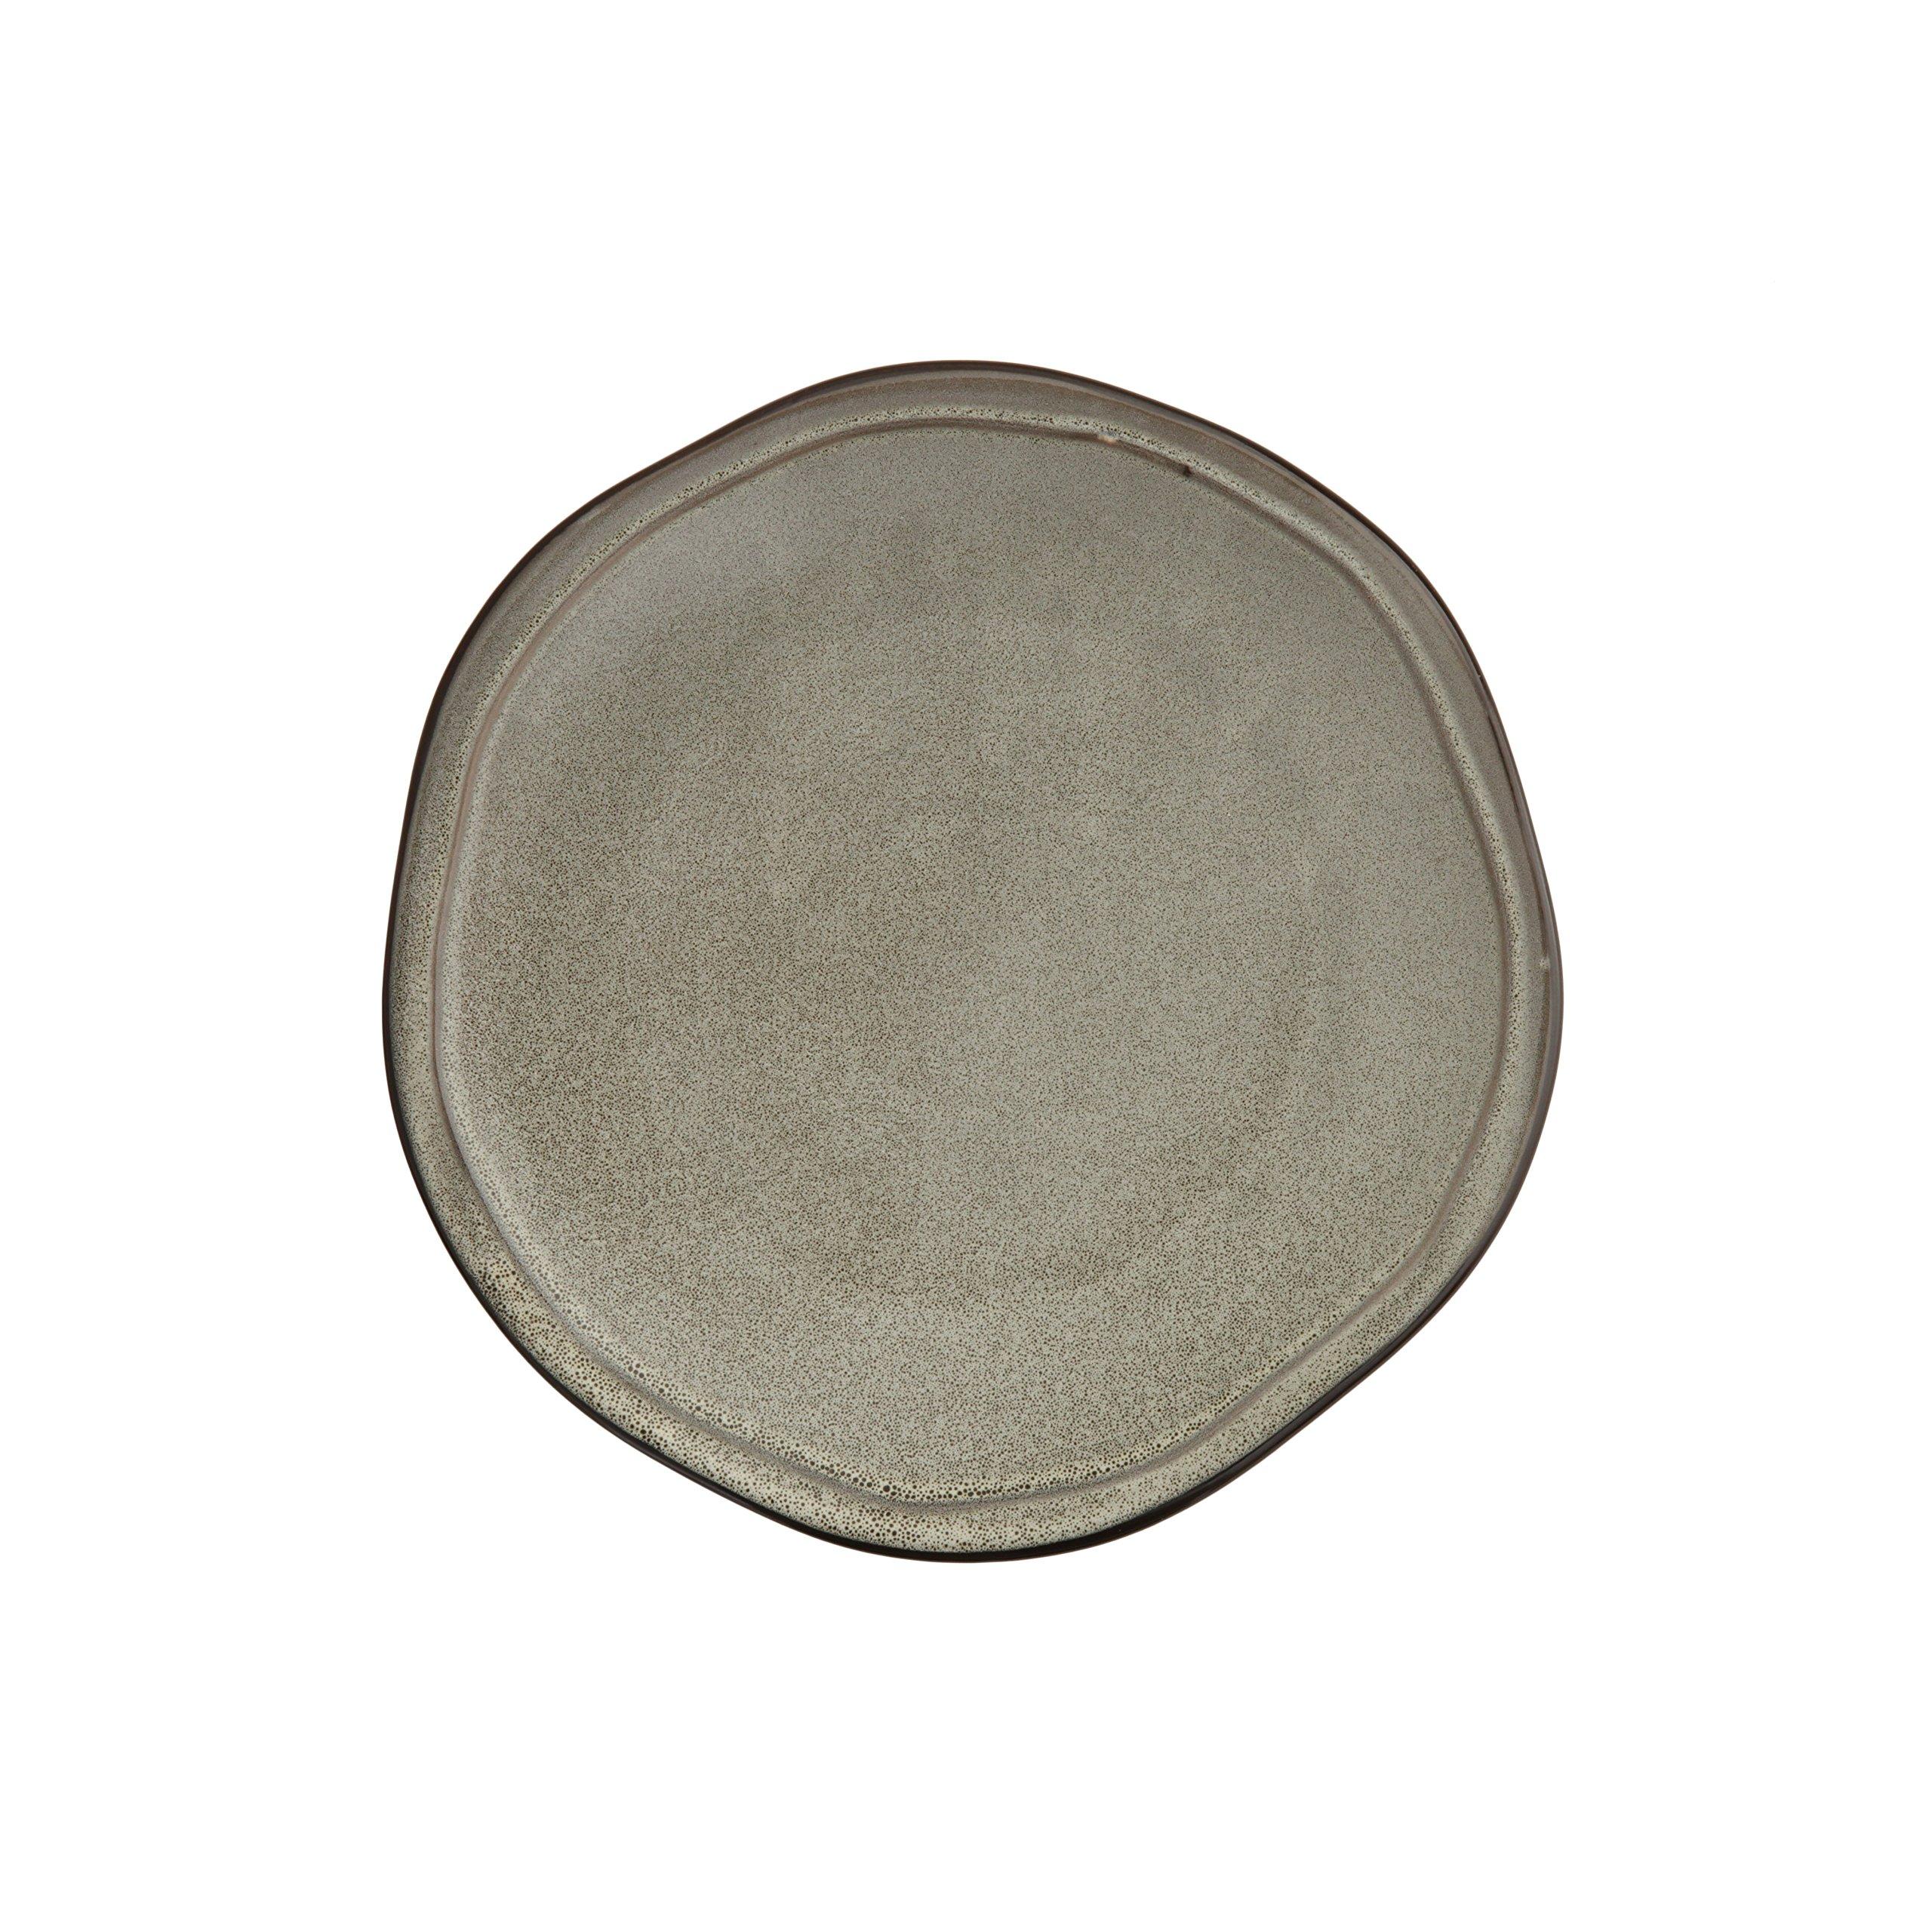 D&V 6 Piece Stōn Porcelain Dinnerware Salad/Dessert Plate Set, 8'', Mist